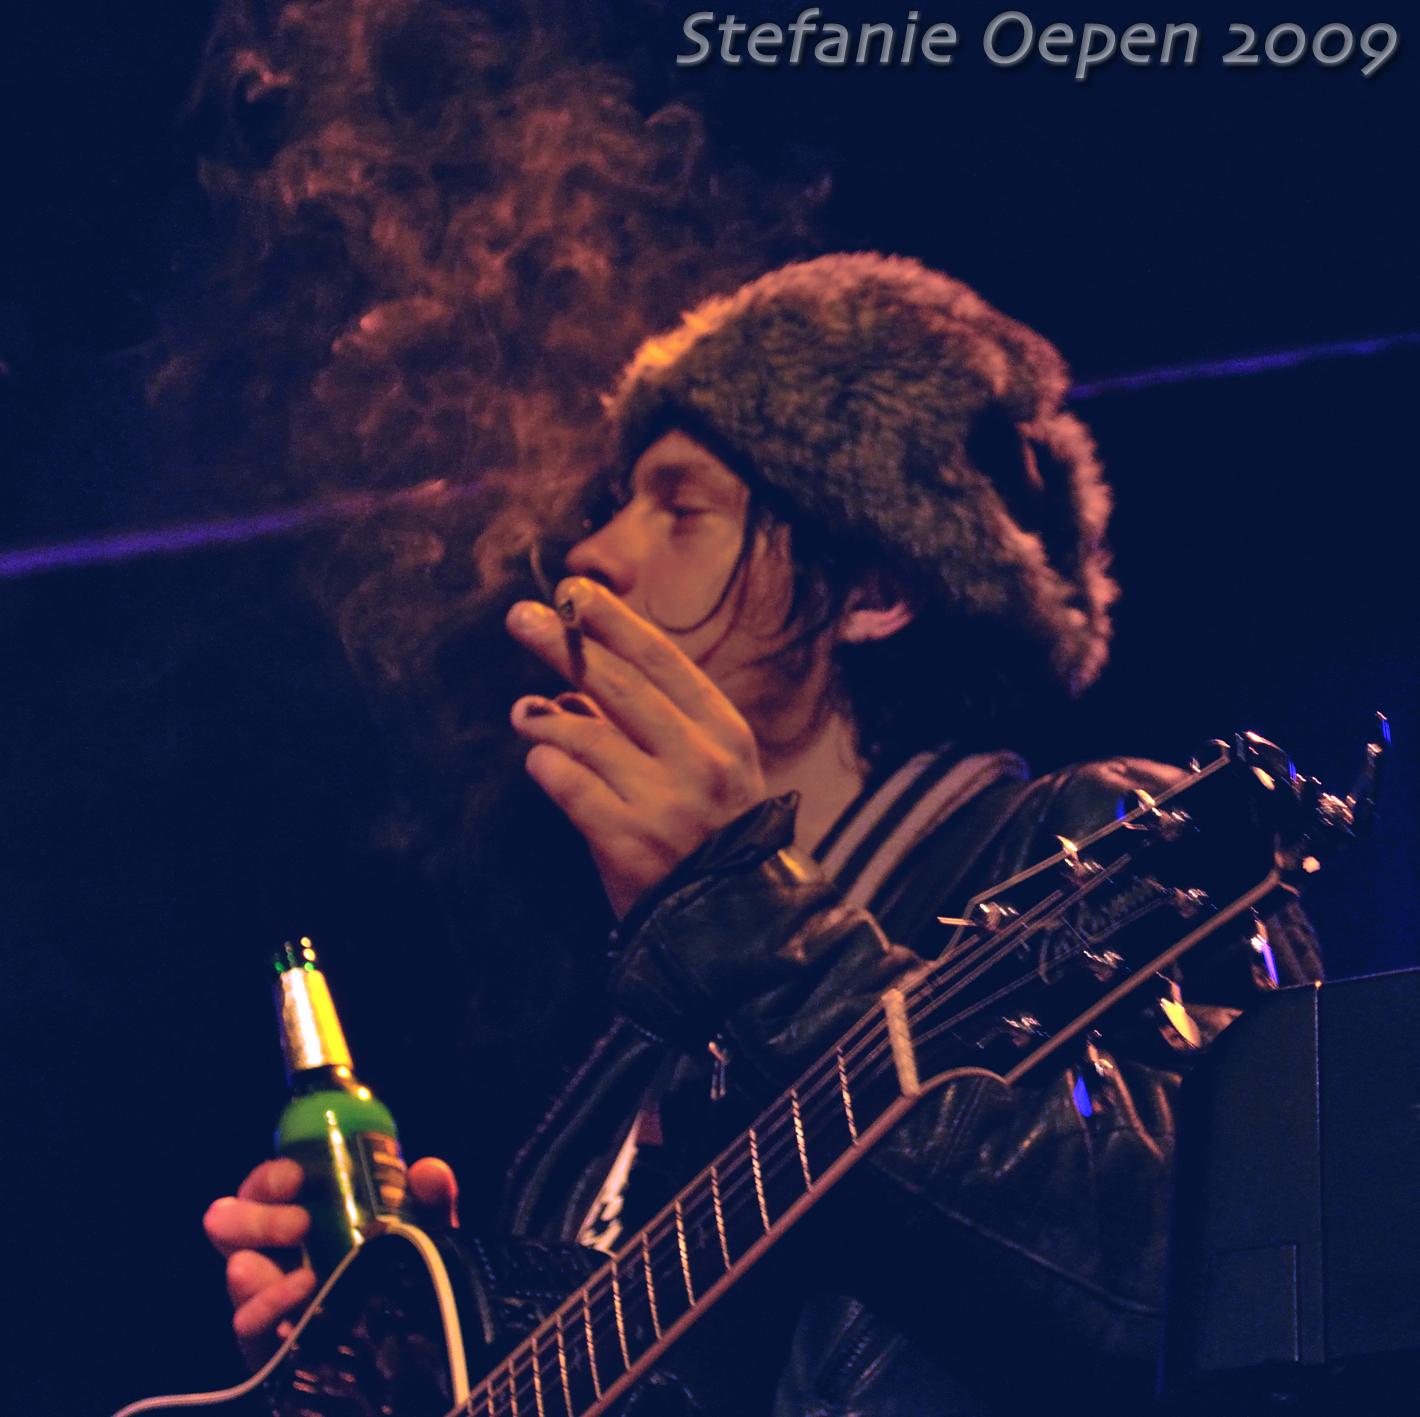 David Bielanko (Marah); Light of Day Germany 2009